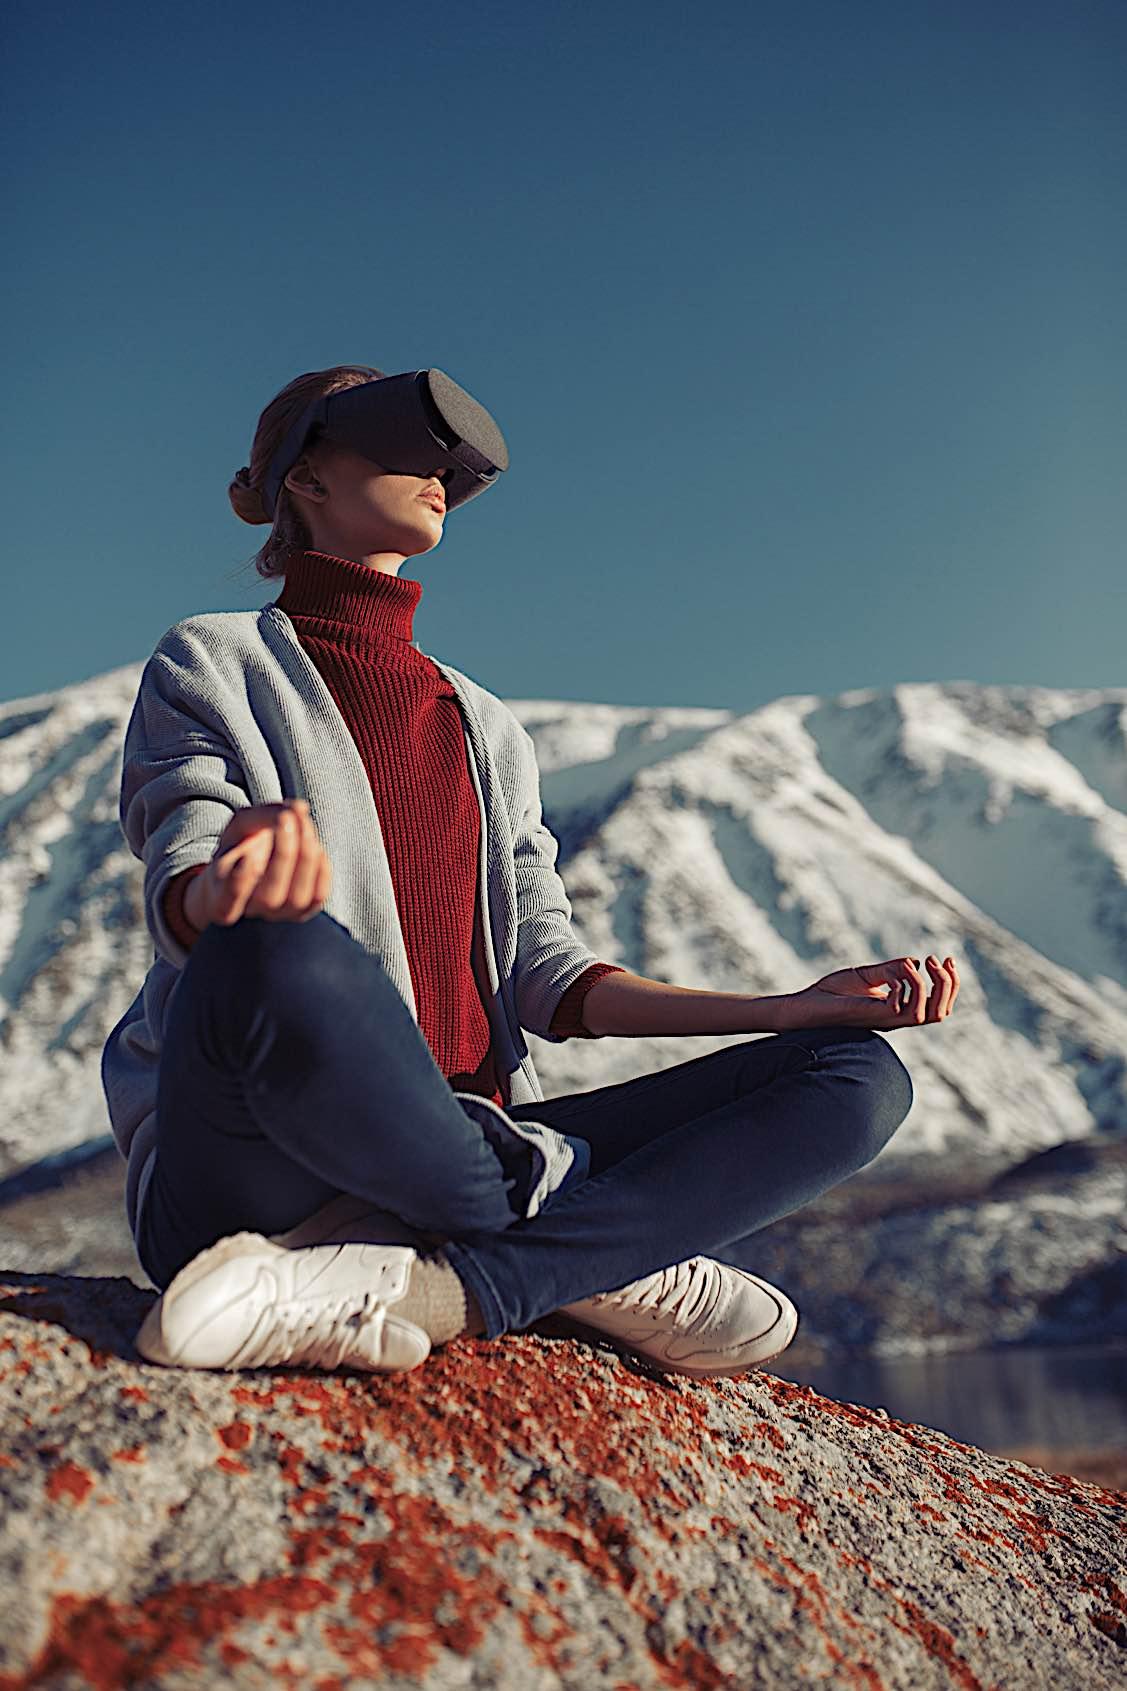 Buddha Weekly Women with virtual reality glasses meditation dreamstime 130154361 ID 130154361 © Yuriyzhuravov Buddhism